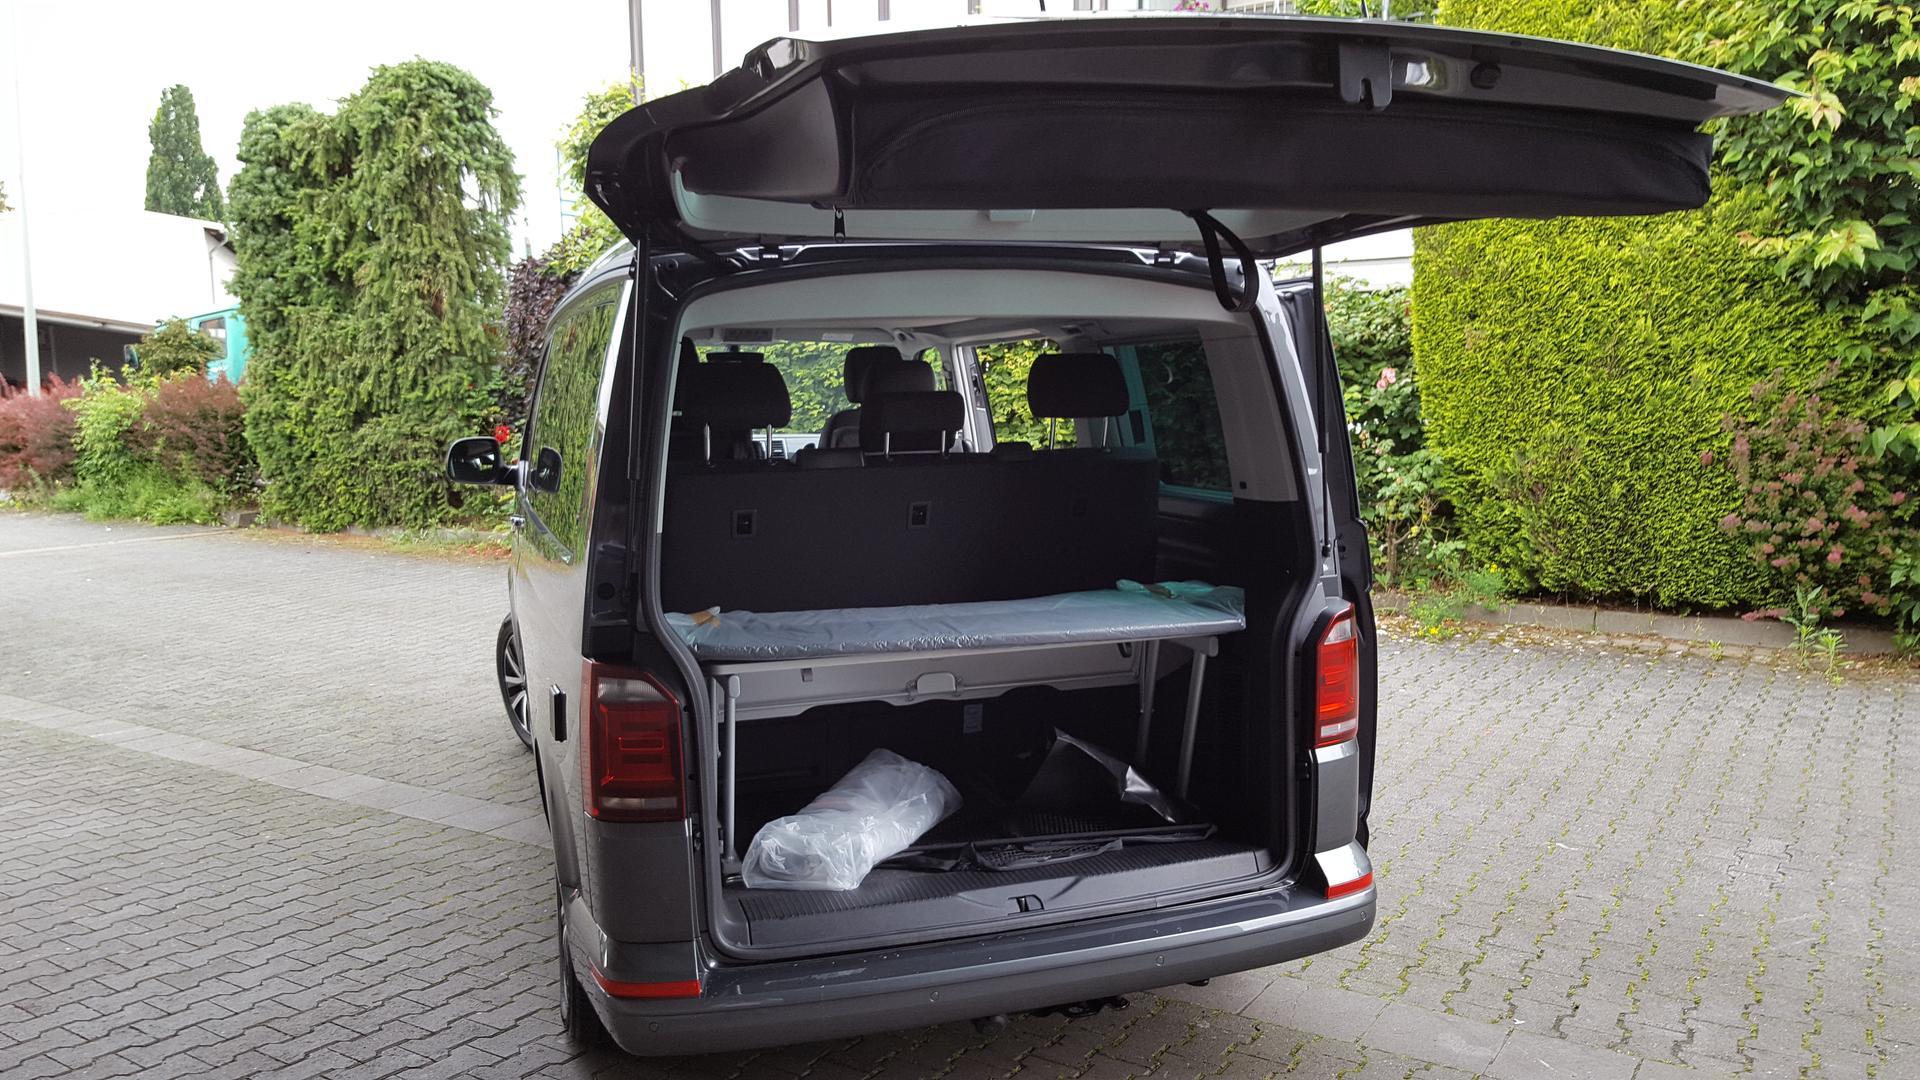 volkswagen t6 california beach edition 2 0 tdi scr bmt 110kw 150ps 4motion dsg 7 gang euro 6d. Black Bedroom Furniture Sets. Home Design Ideas